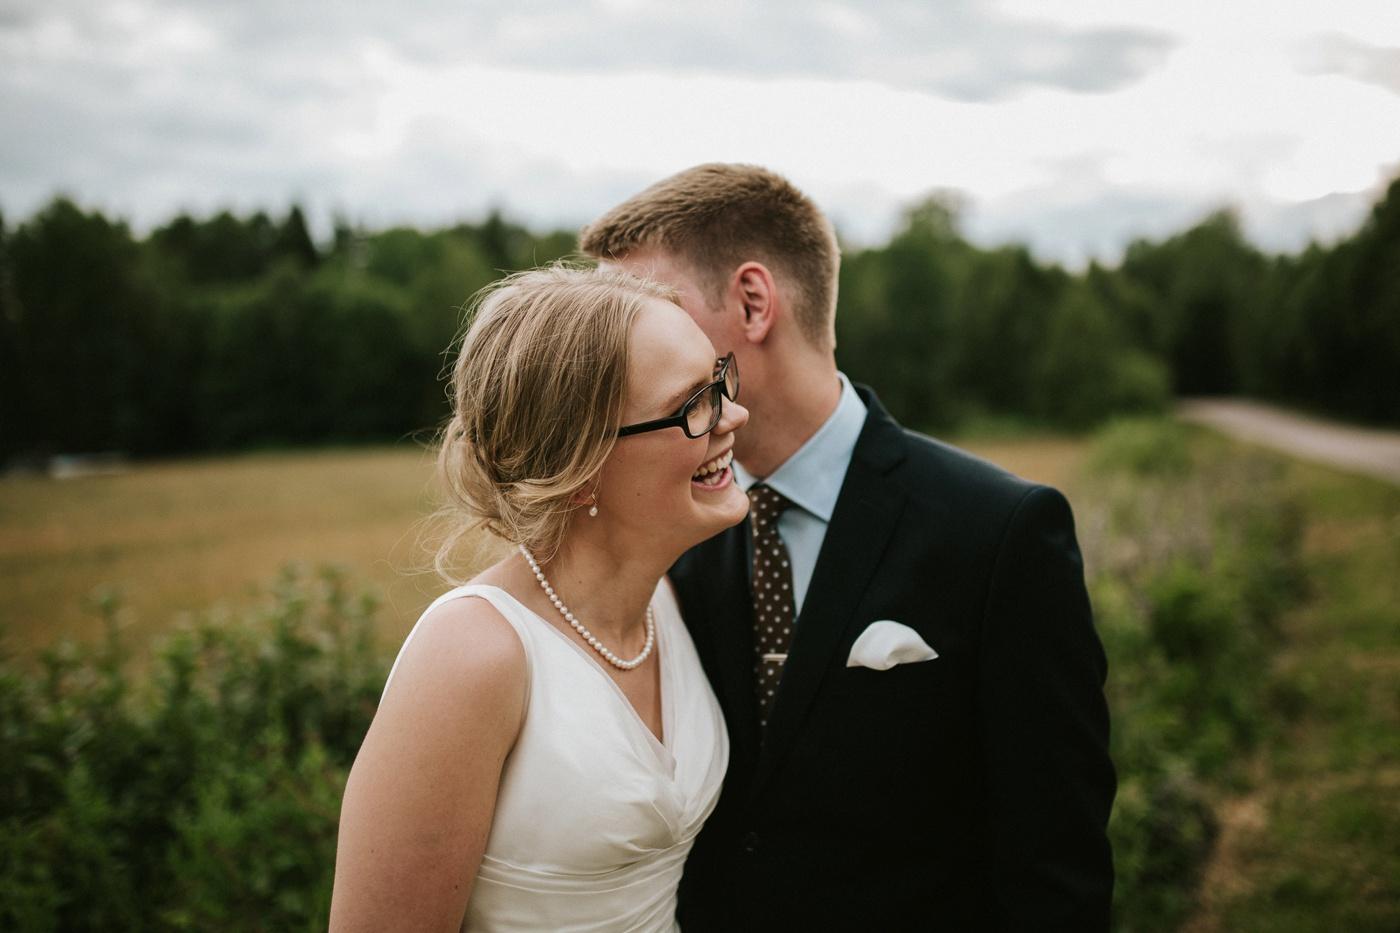 ceciliajoakim_sweden-countryside-summer-wedding_melbourne-fun-quirky-wedding-photography_91